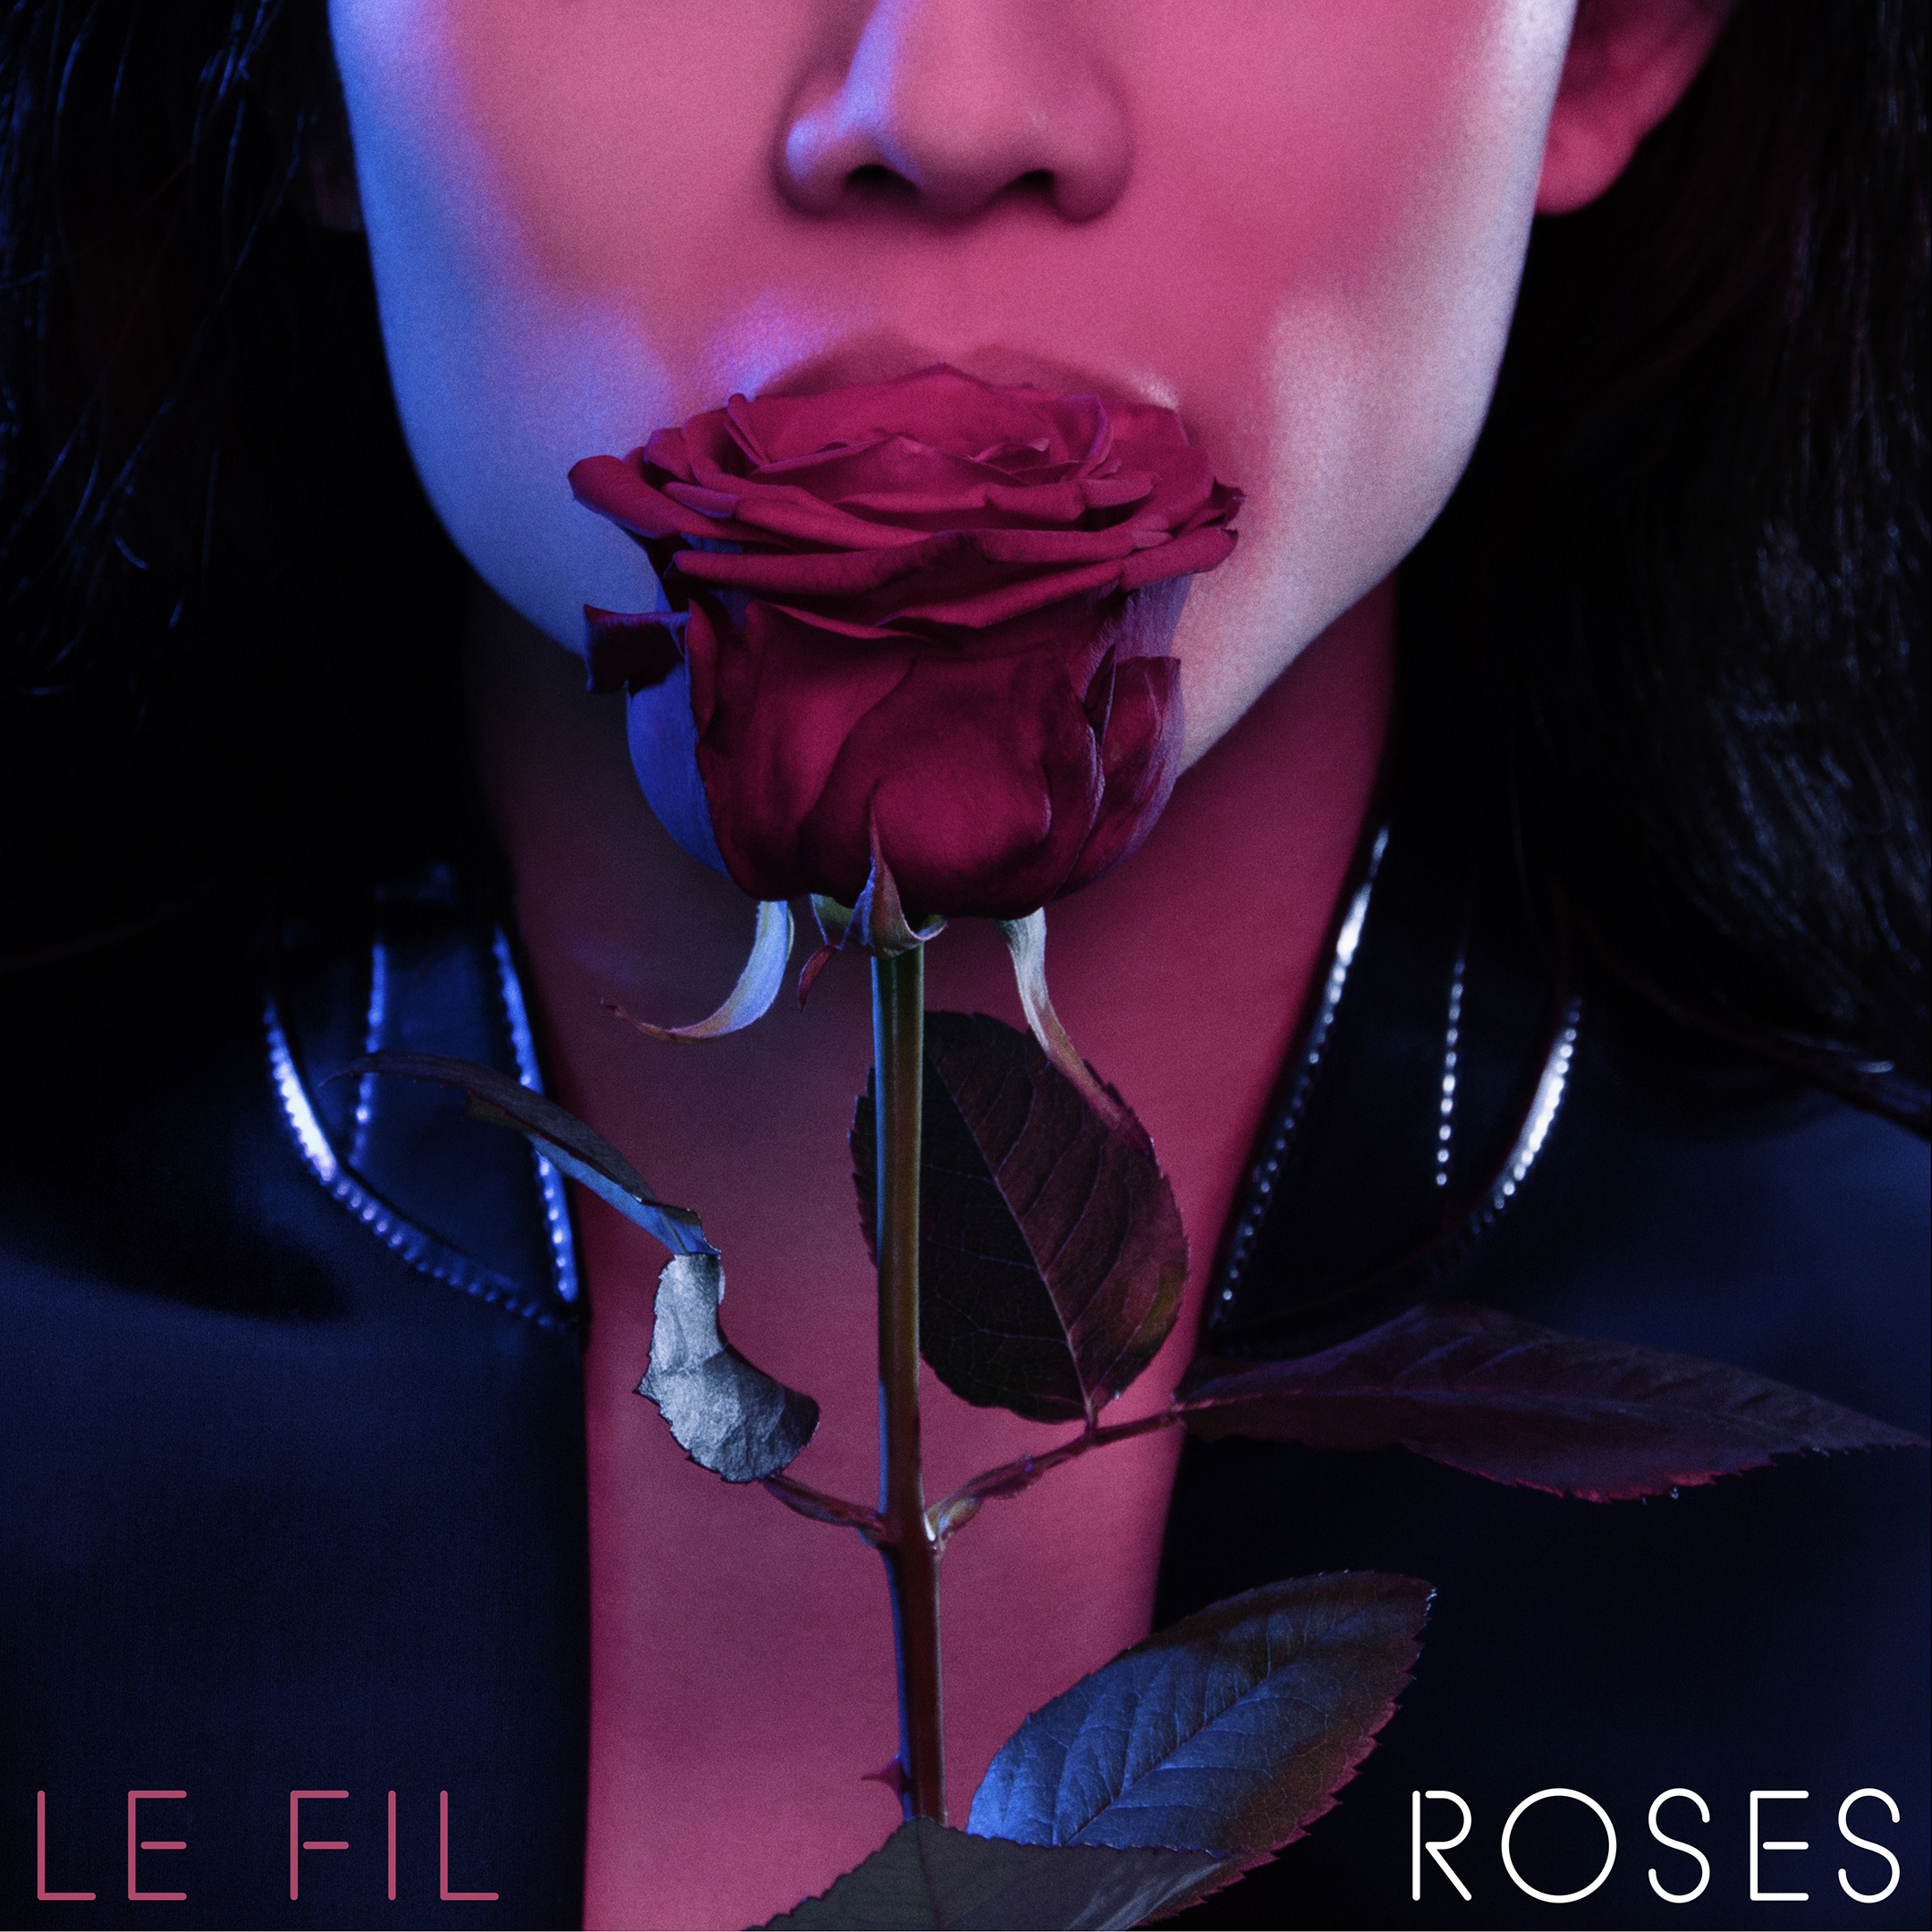 Roses+Cover+web+ready+150+36x36.jpg